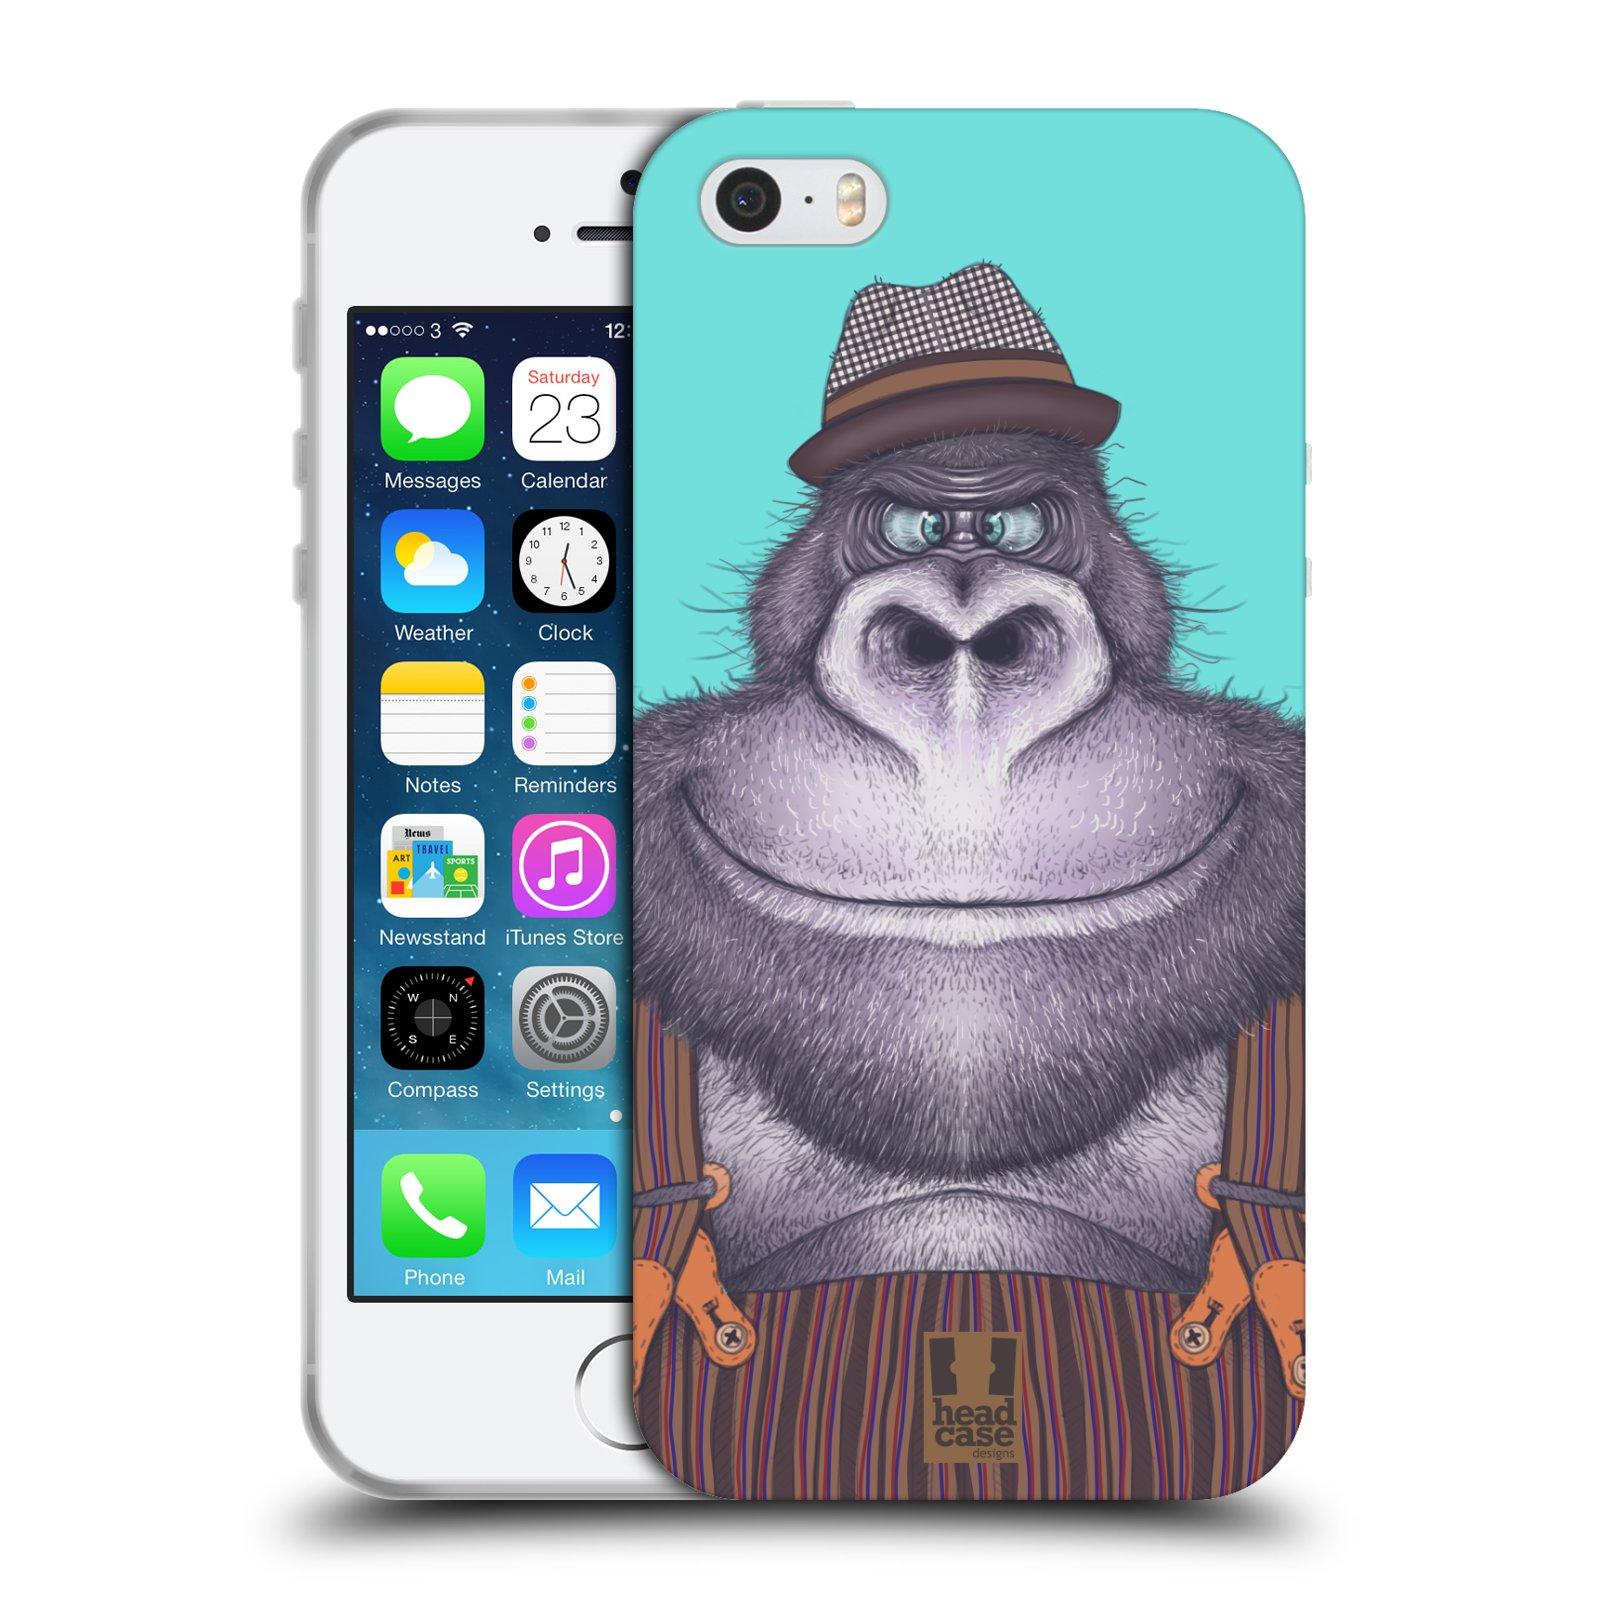 HEAD CASE silikonový obal na mobil Apple Iphone 5/5S vzor Kreslená zvířátka gorila